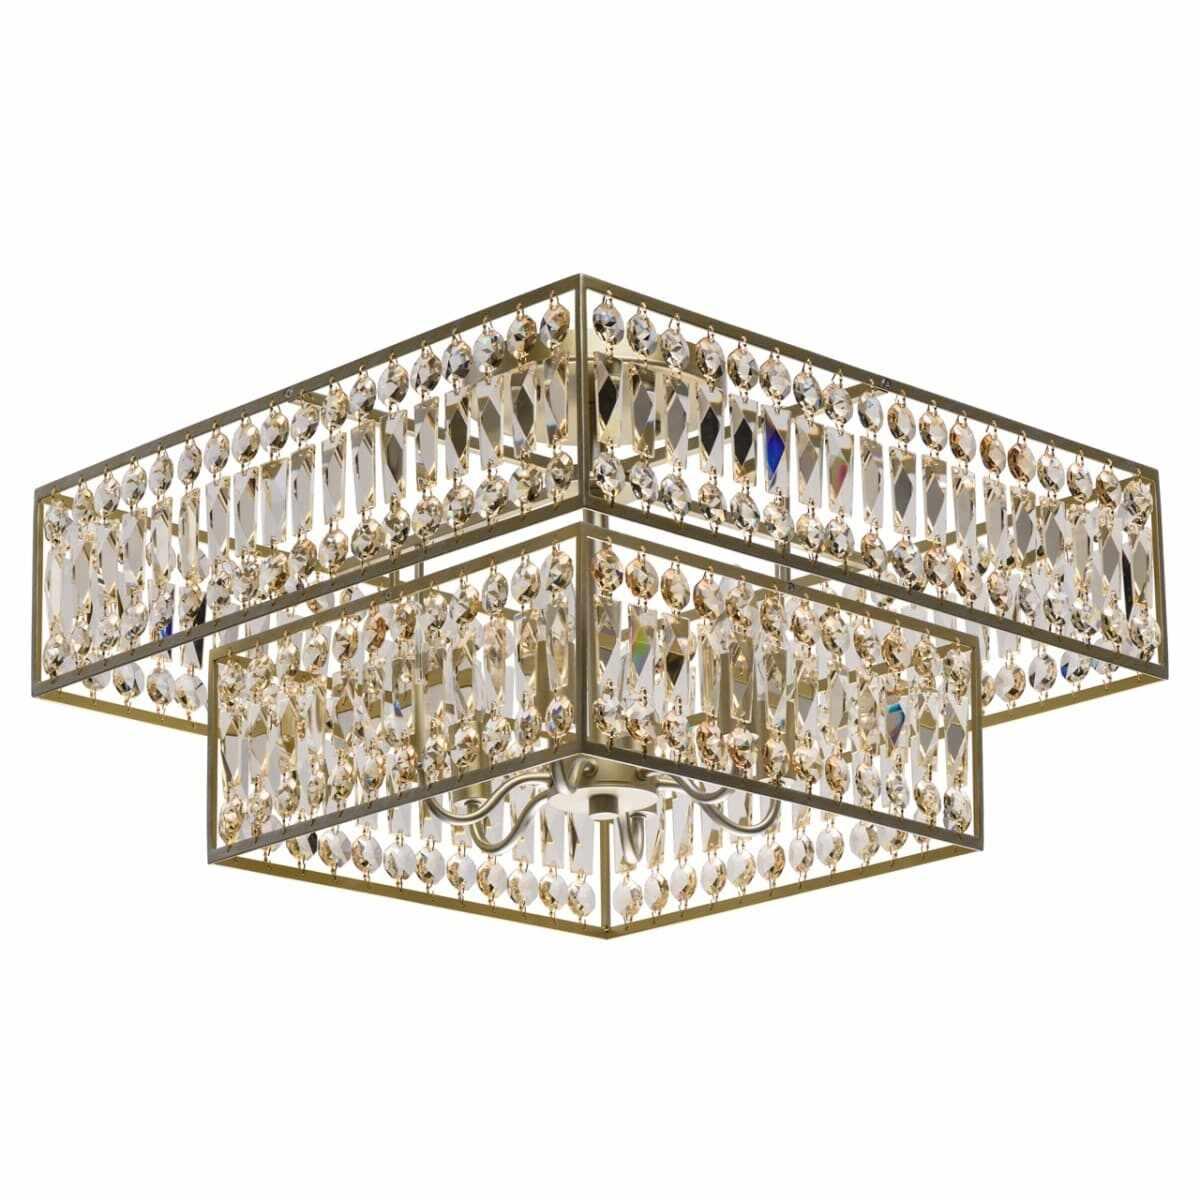 Plafoniera MW-Light Crystal Monarch 121012306 la pret 4697 lei